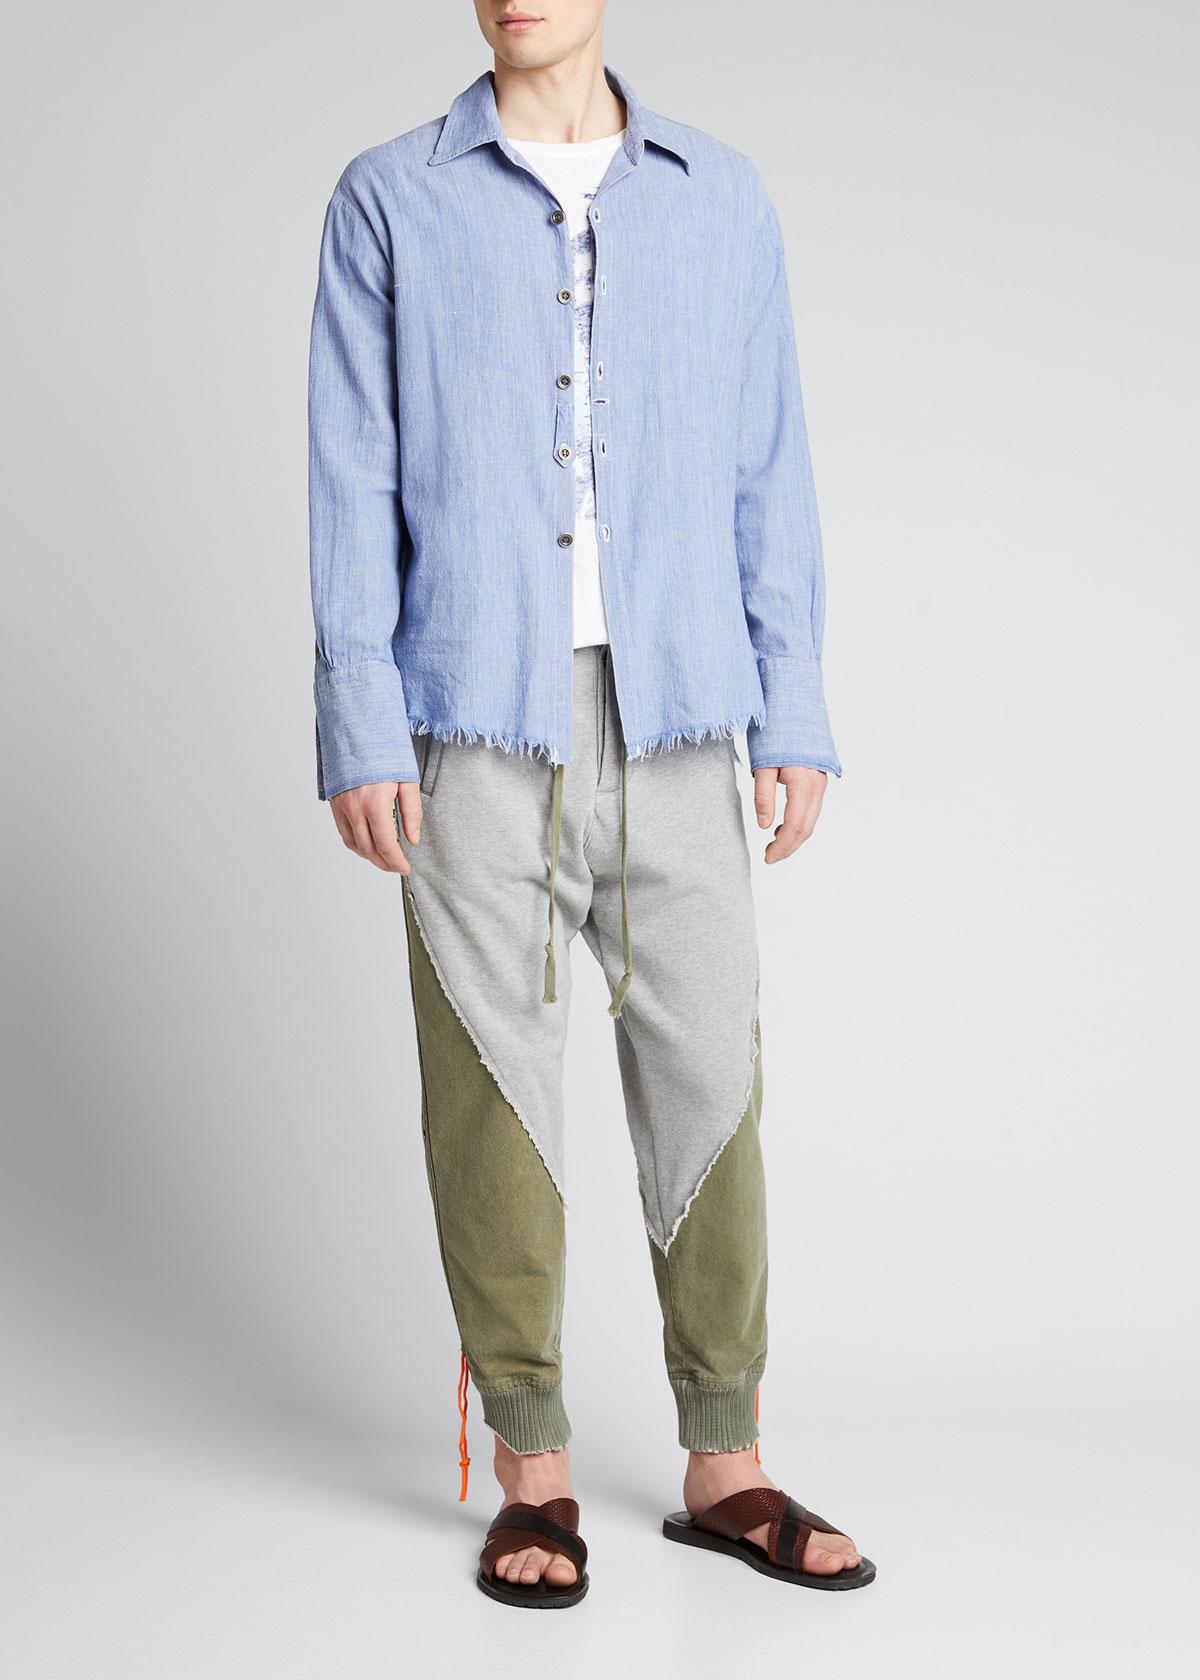 Greg Lauren MEN'S CHAMBRAY RAW-EDGE DRESS SHIRT